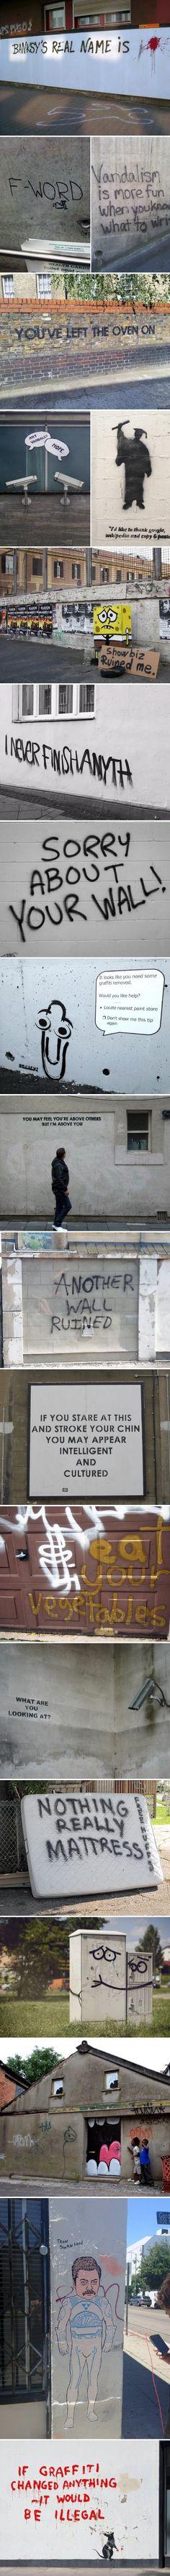 Some funny Graffitis